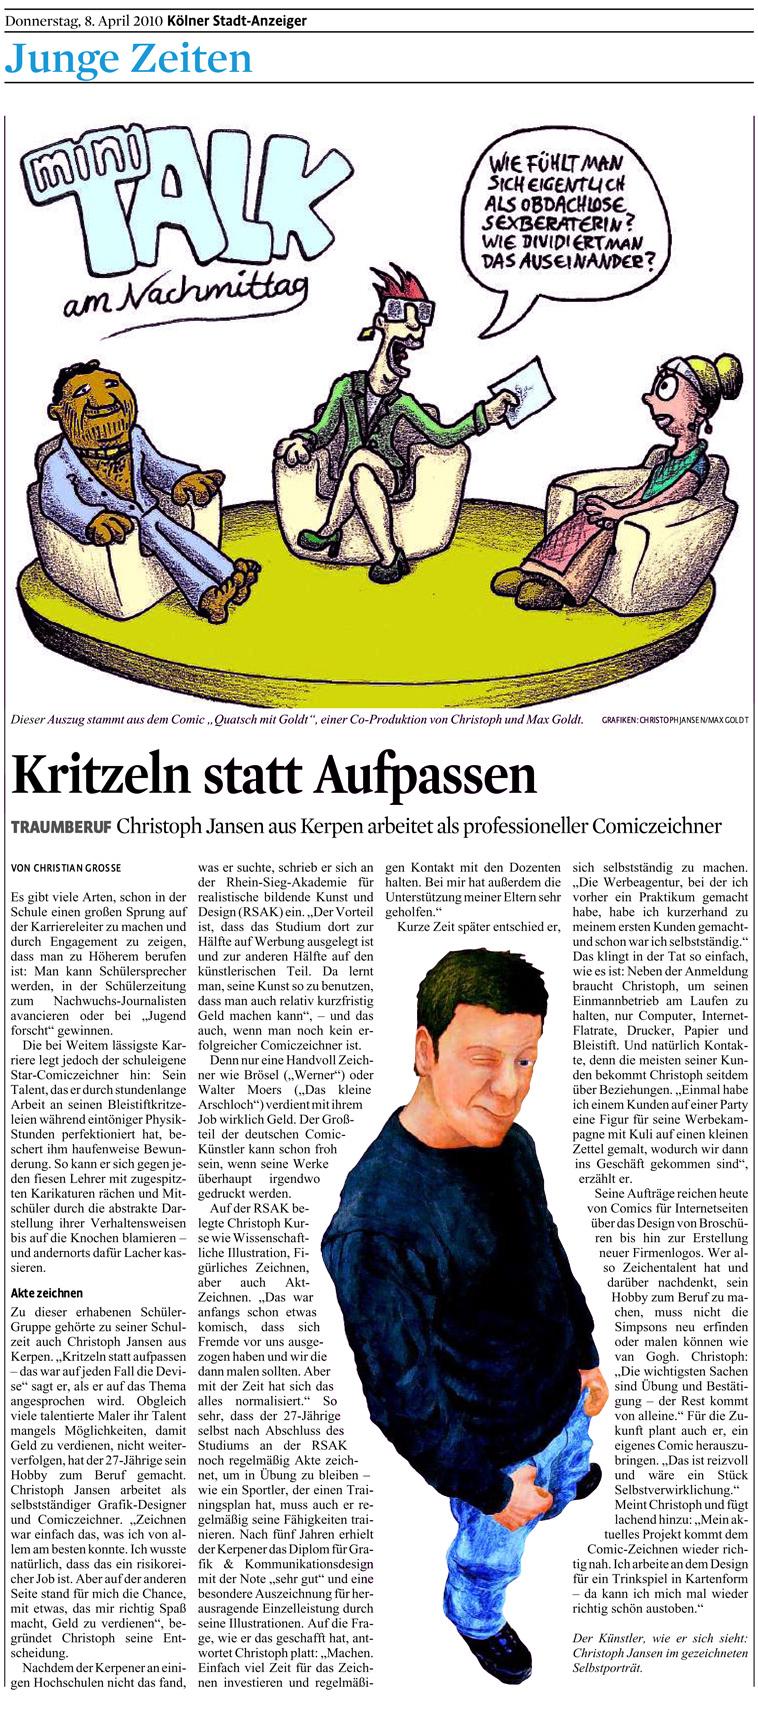 Kölner Stadt-Anzeiger 8. April